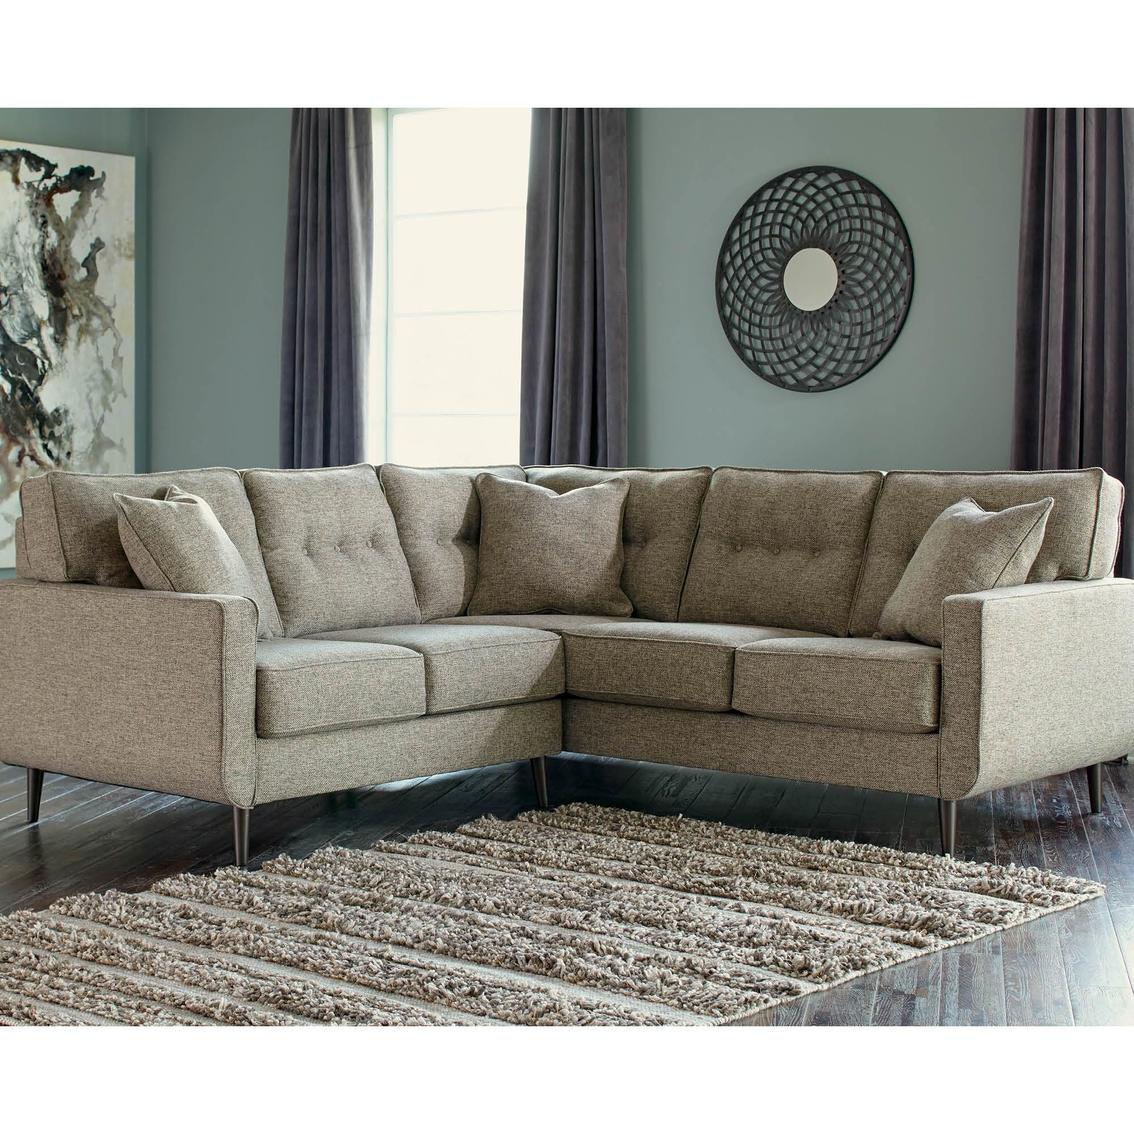 sectional sofa corner wedge best power recliner sofas benchcraft dahra 2 pc laf loveseat raf